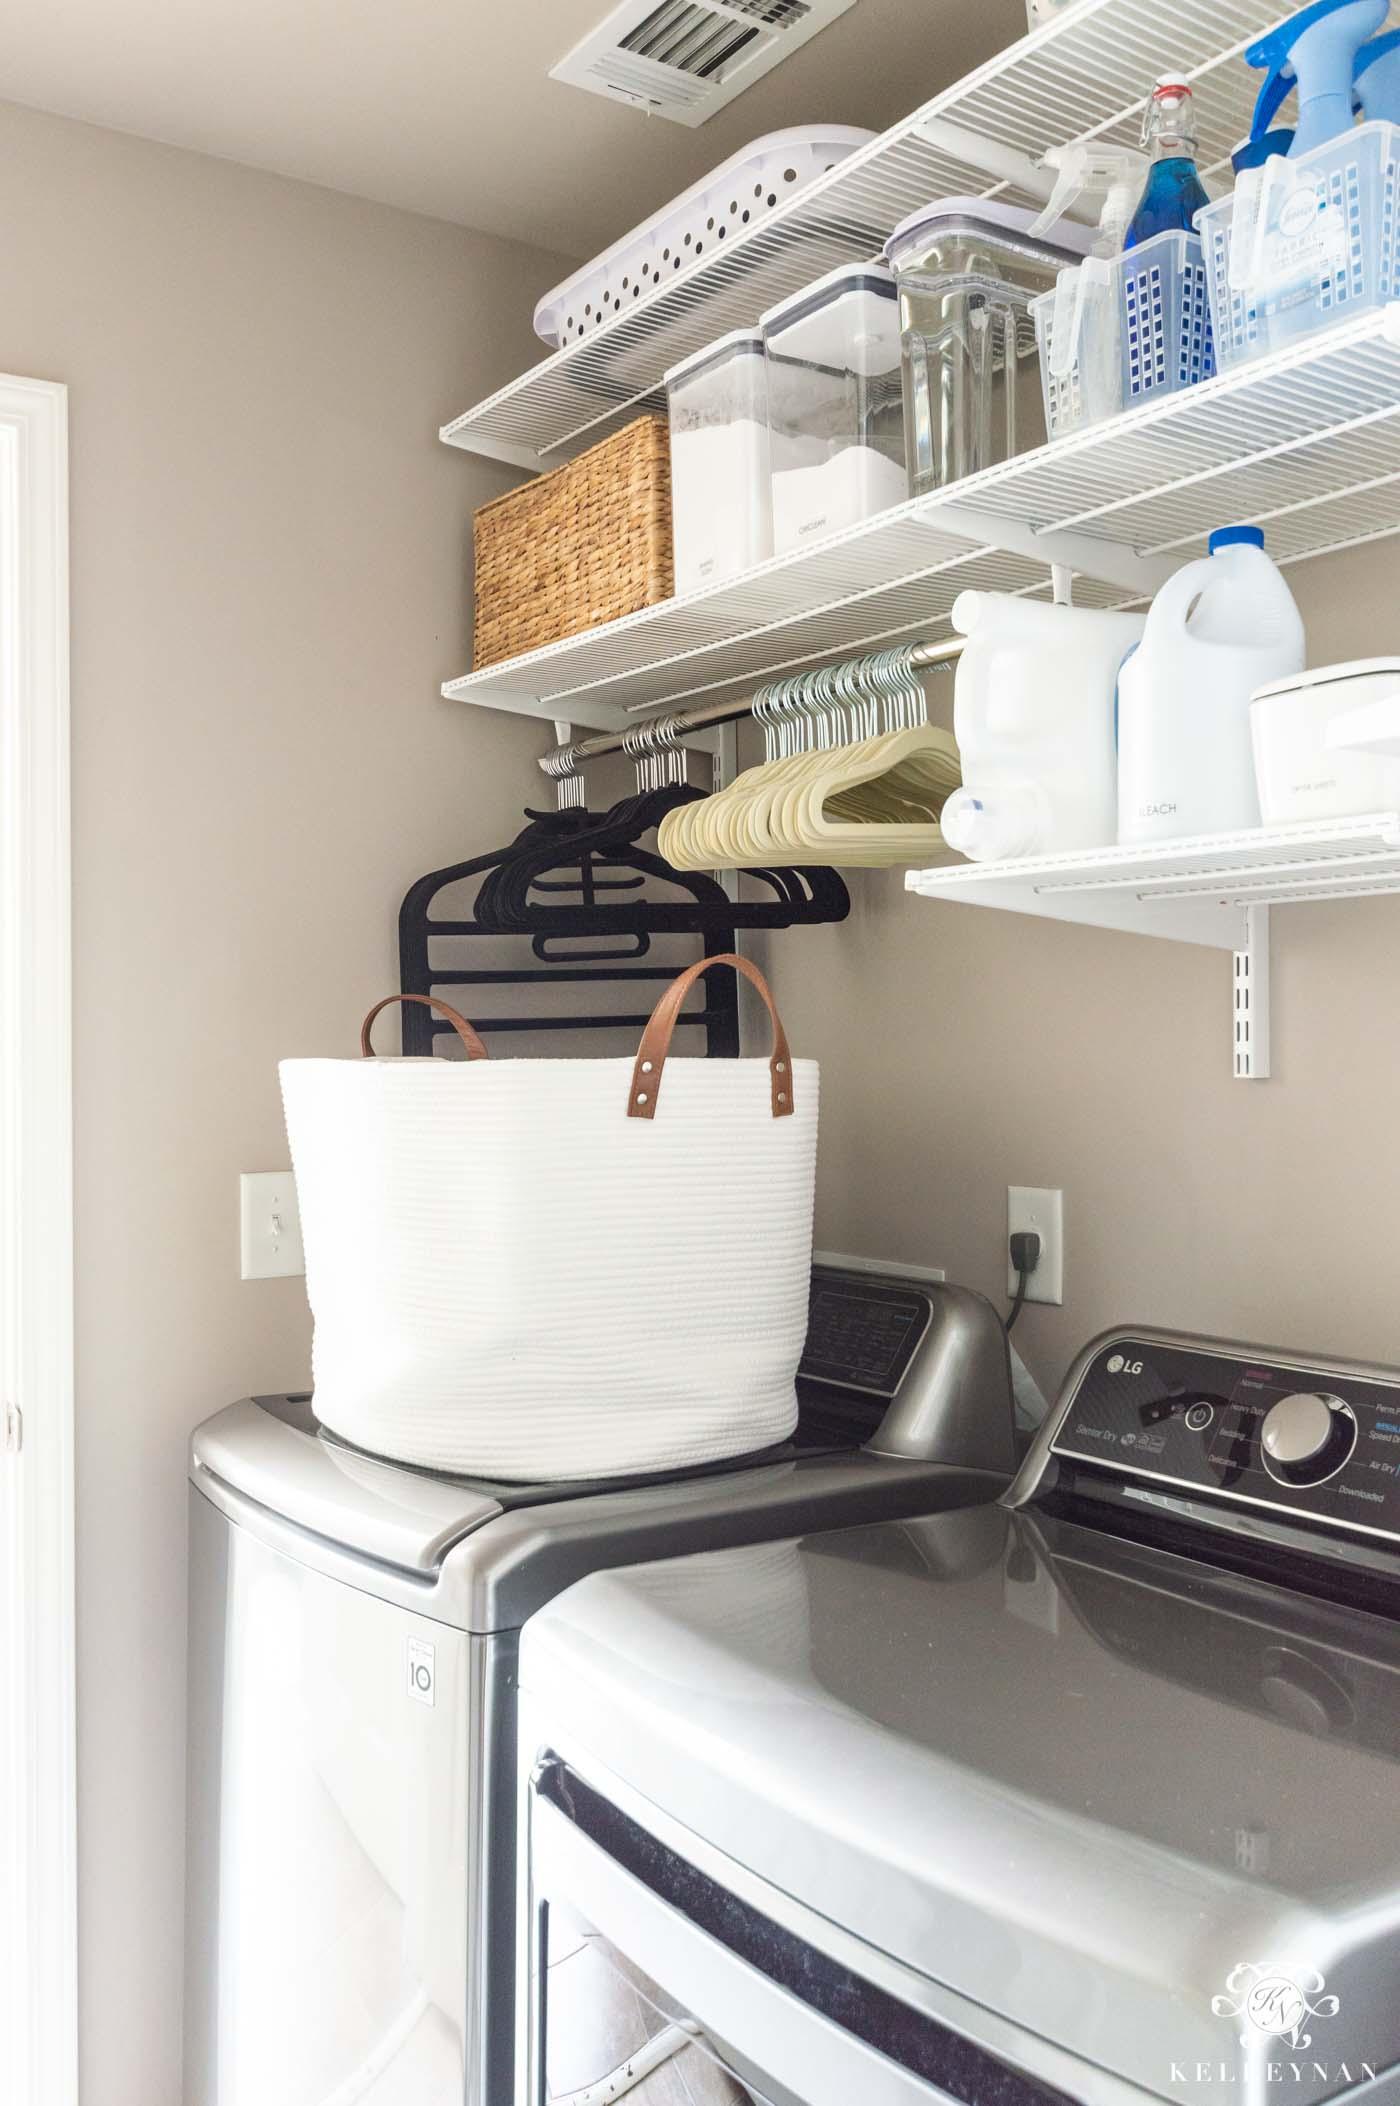 Small Laundry Room Organization Ideas | Kelley Nan on Laundry Room Organization Ideas  id=57692